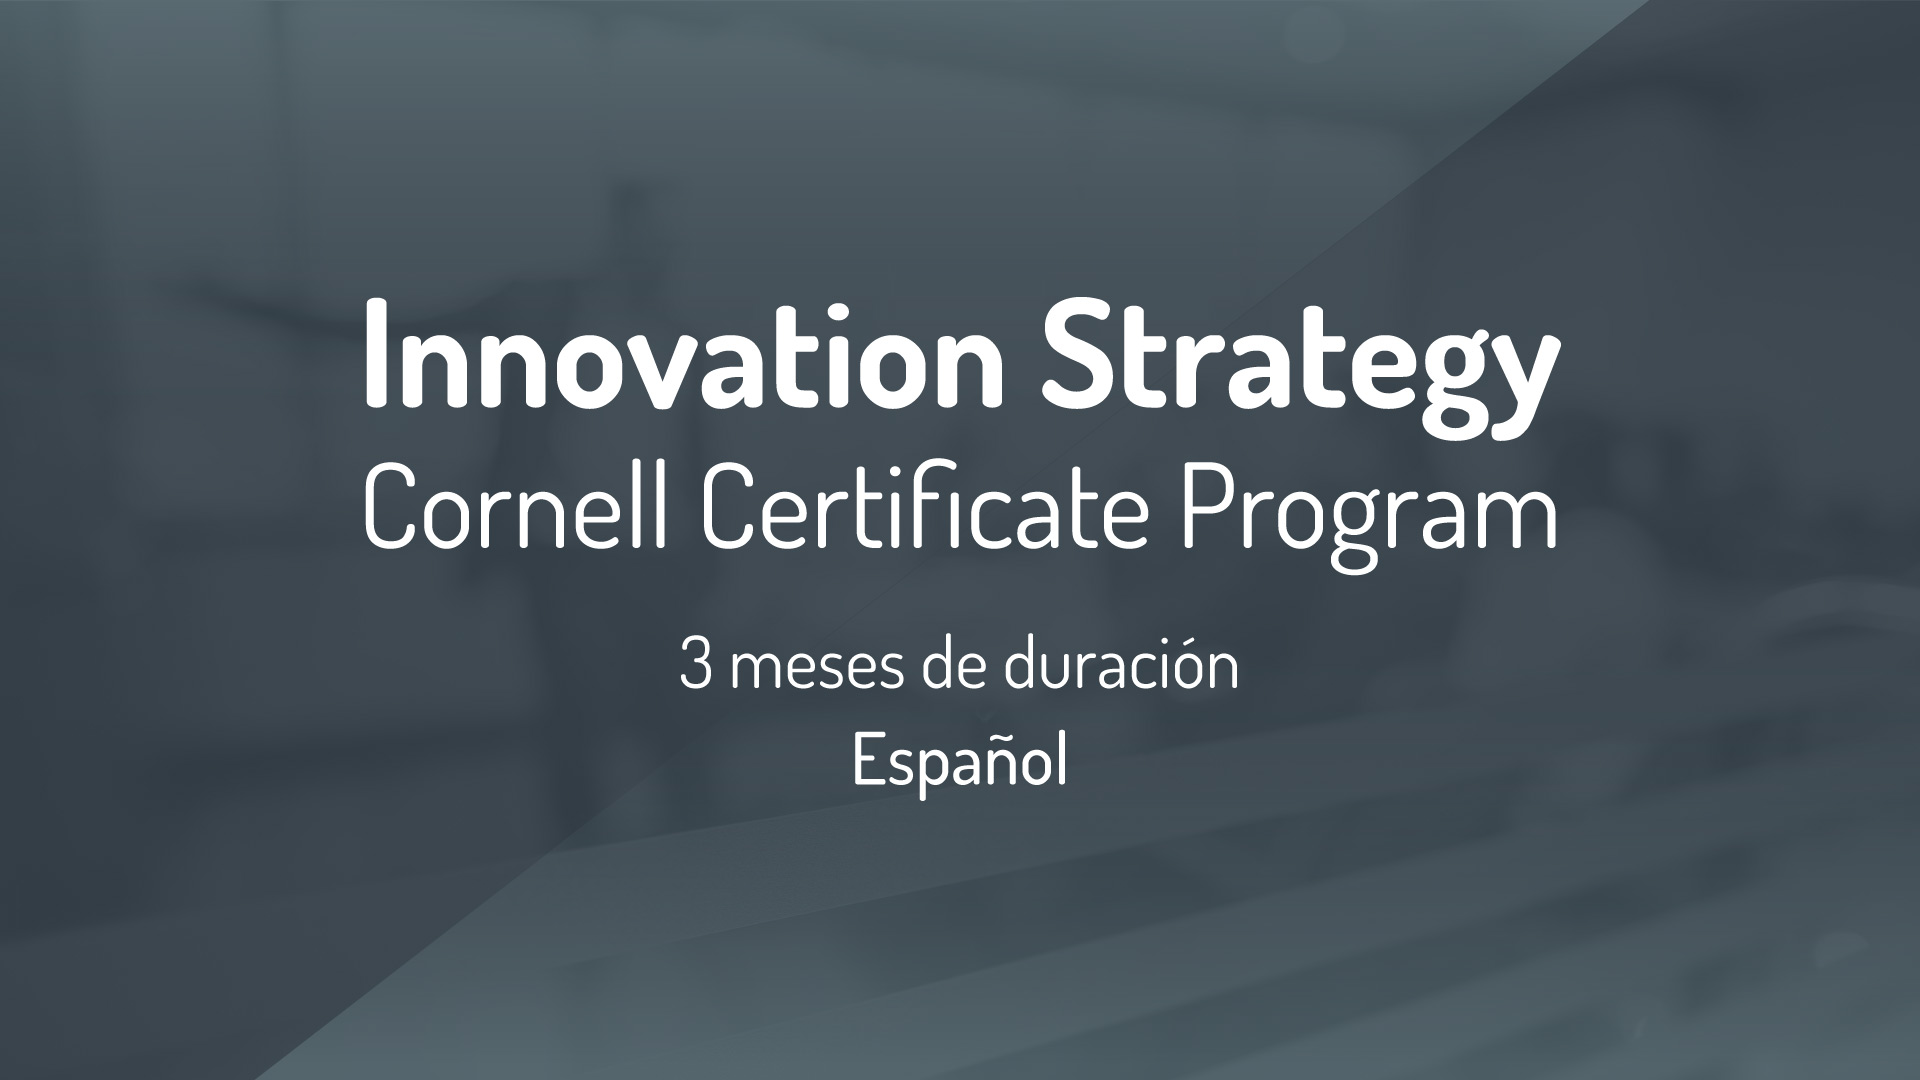 cornell certificate programs